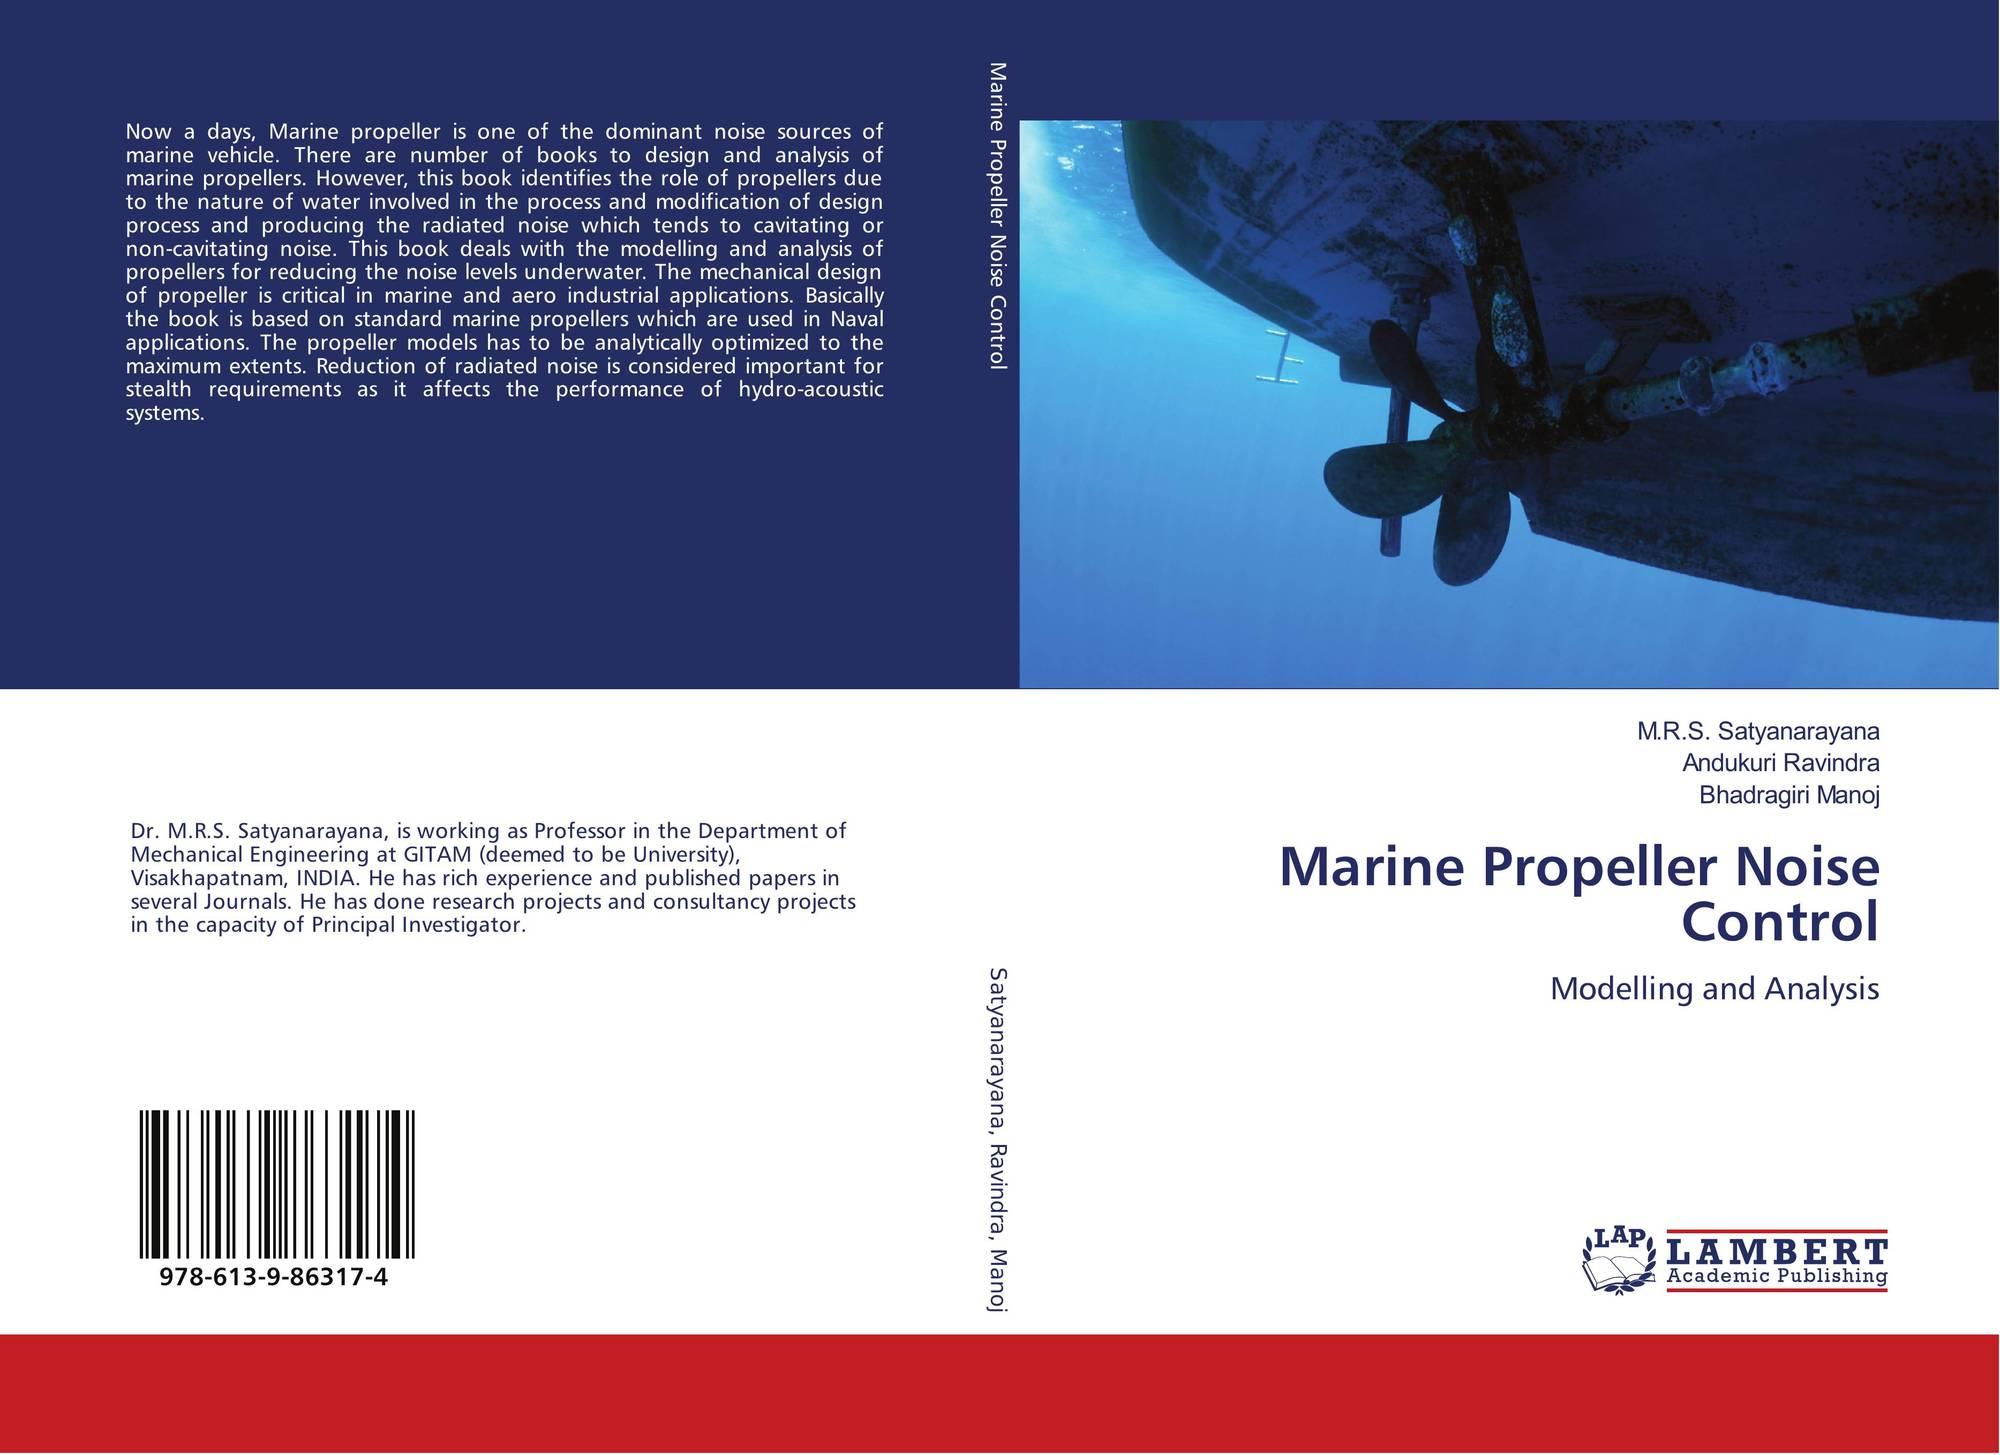 Marine Propeller Noise Control, 978-613-9-86317-4